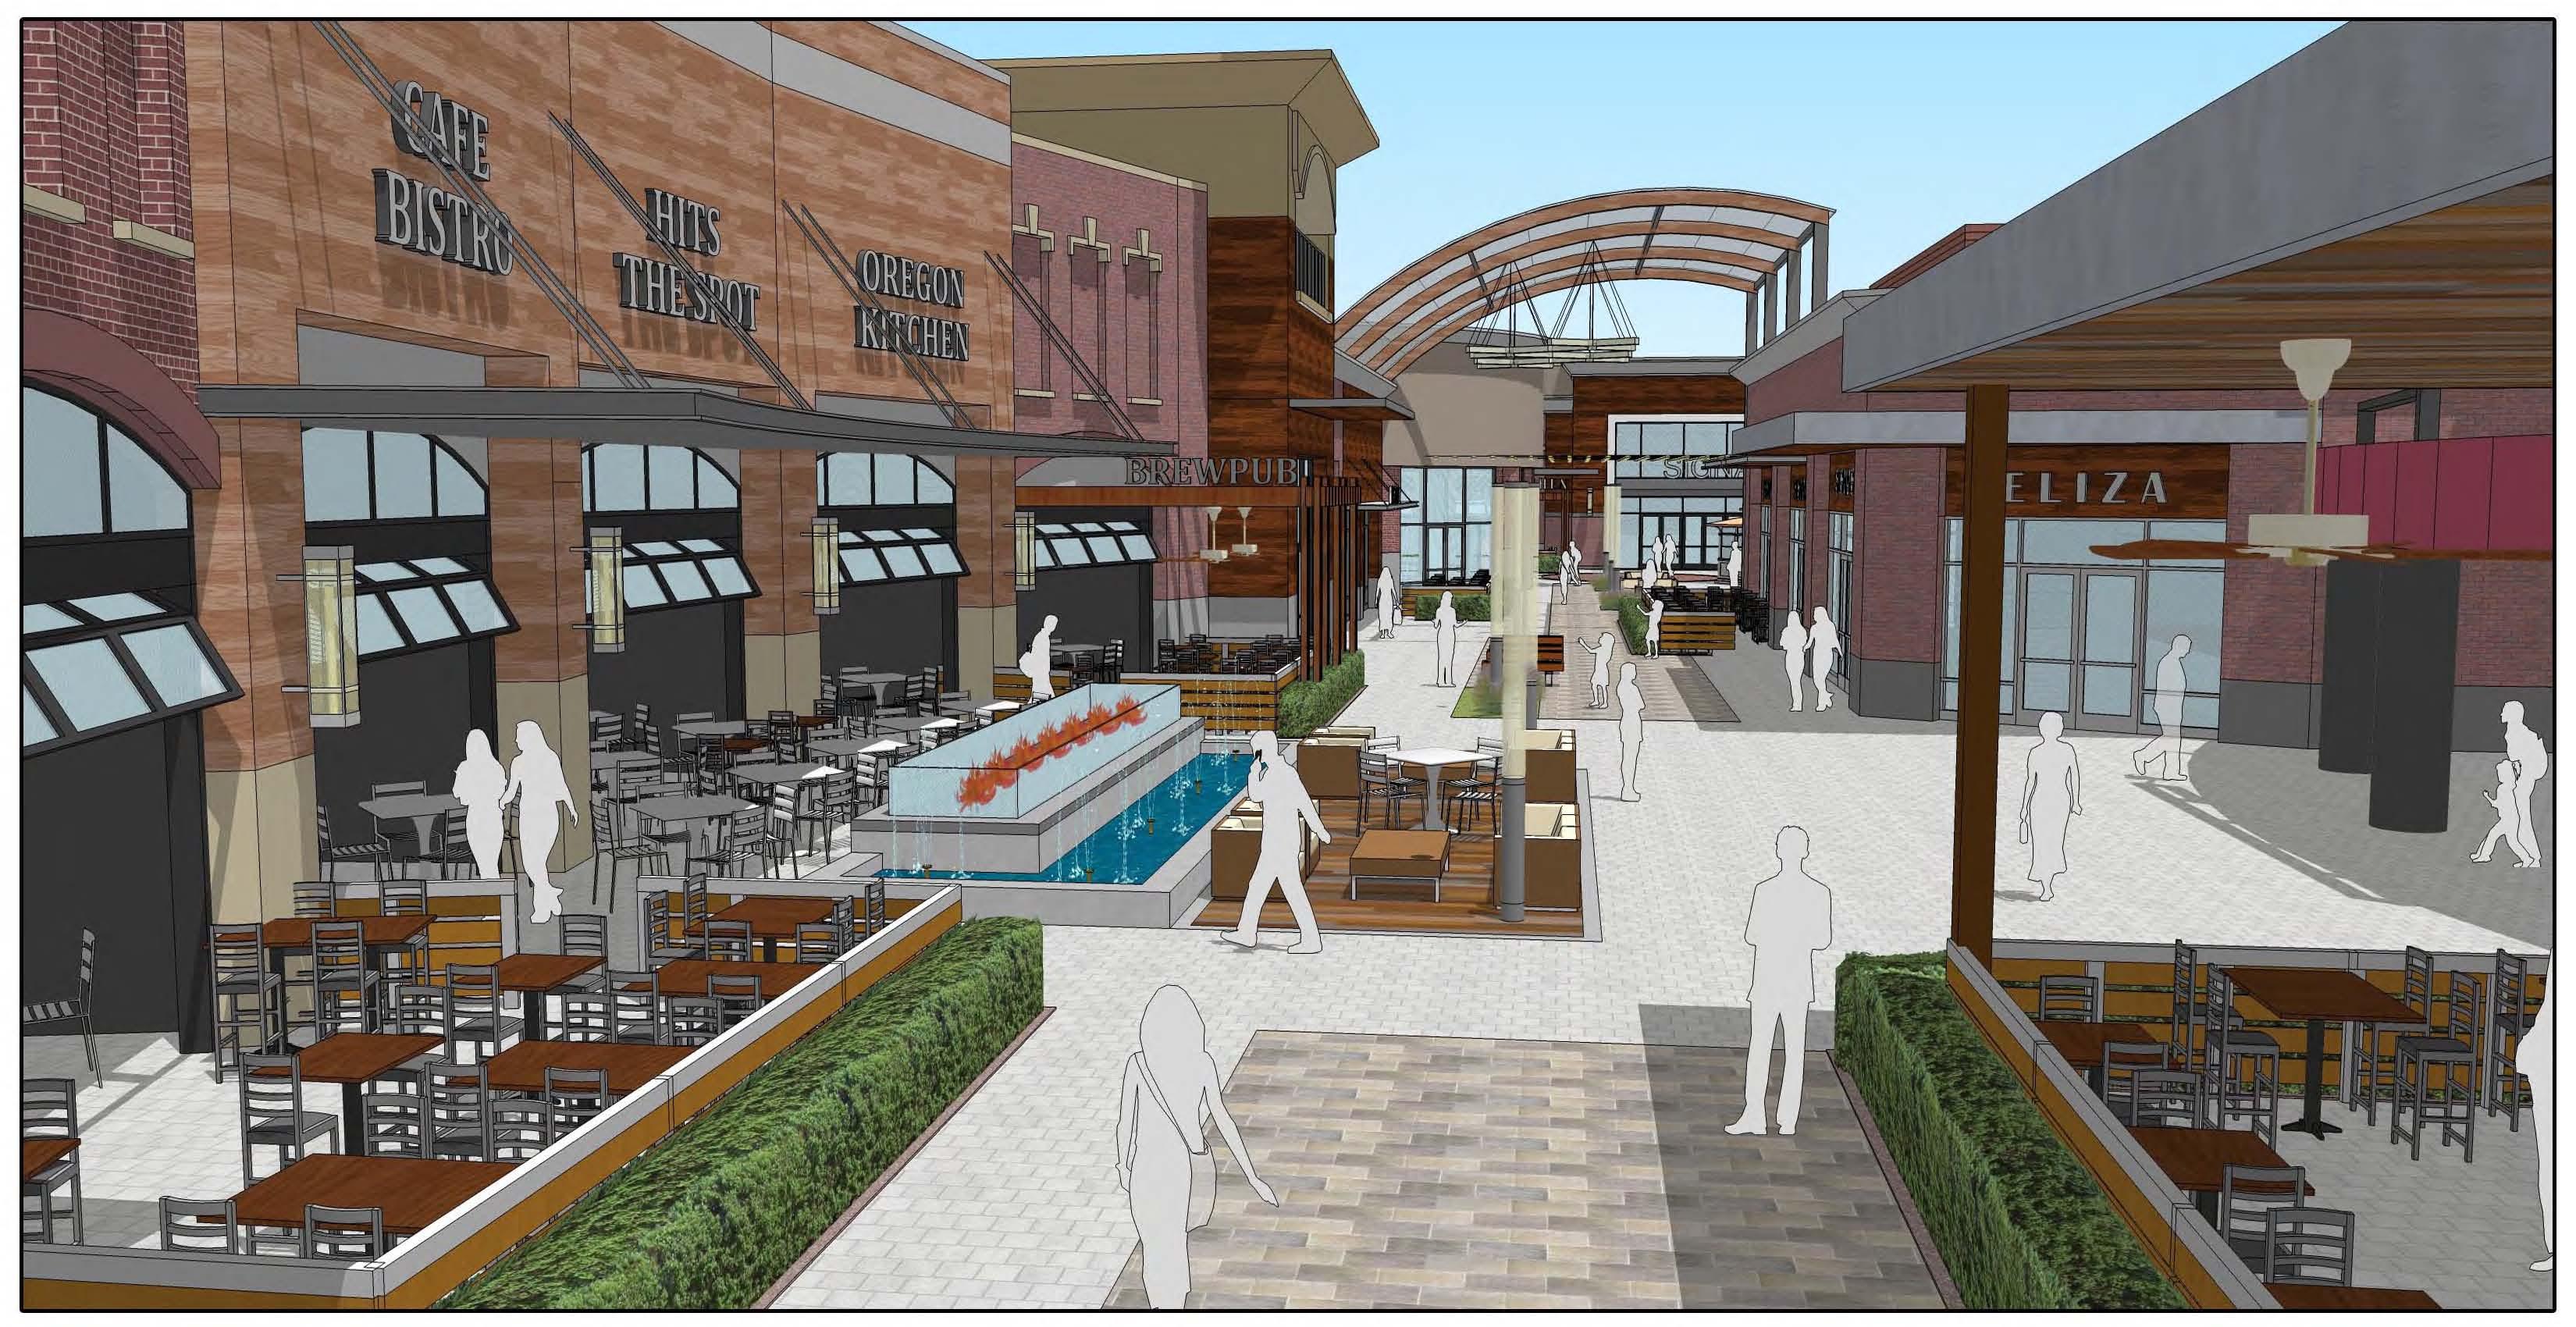 medford center renovation plans revealed kobi tv nbc5